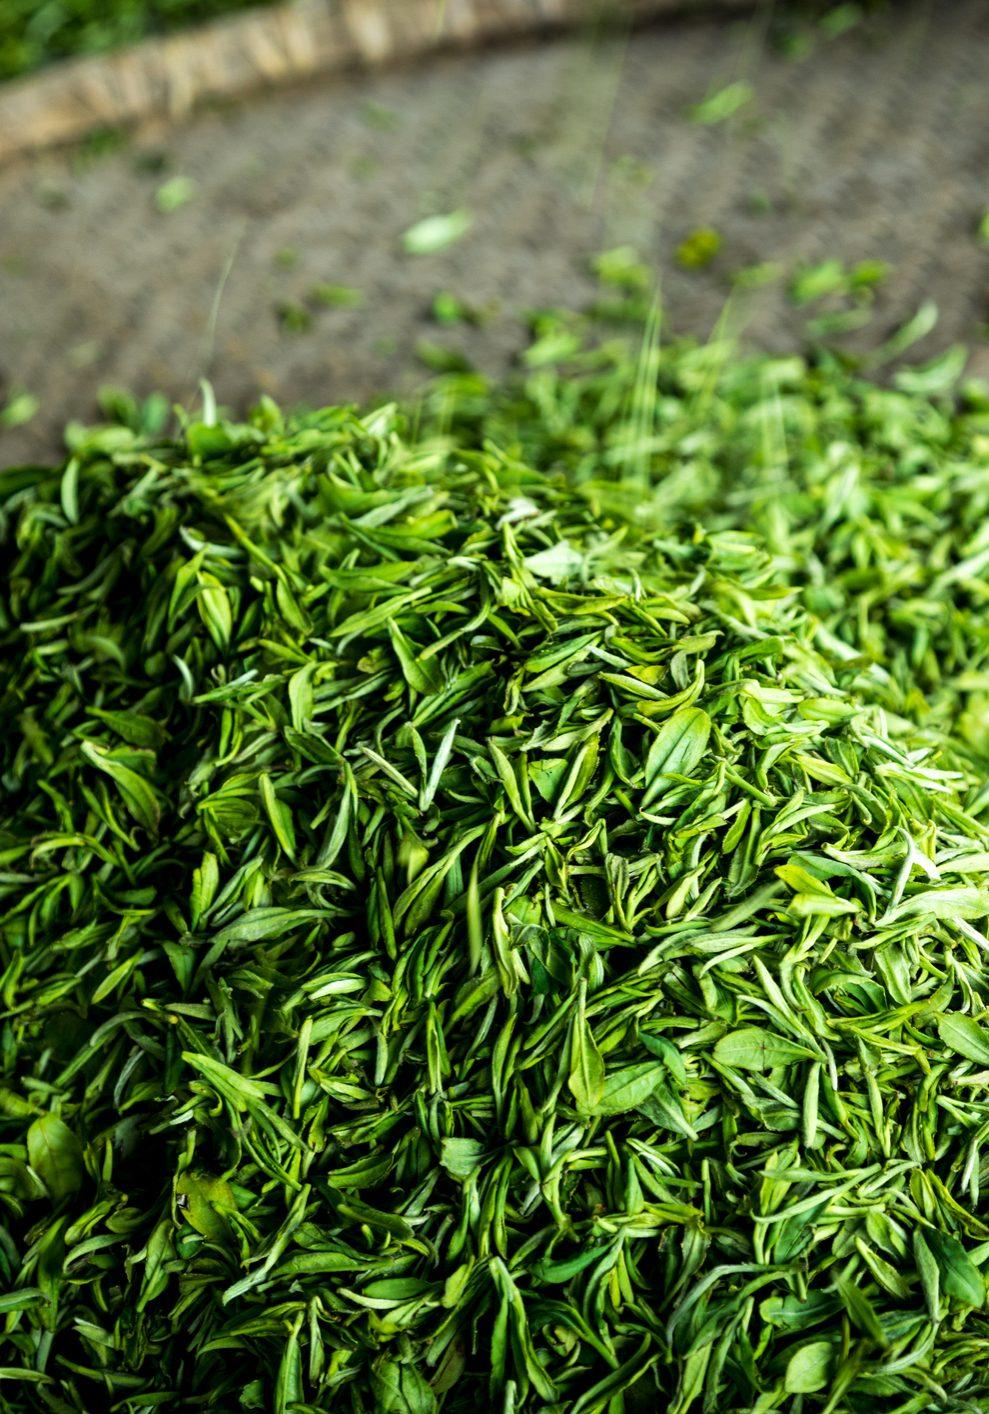 Green tea in a flat round split bamboo basket at Meijiawu of Hangzhou.